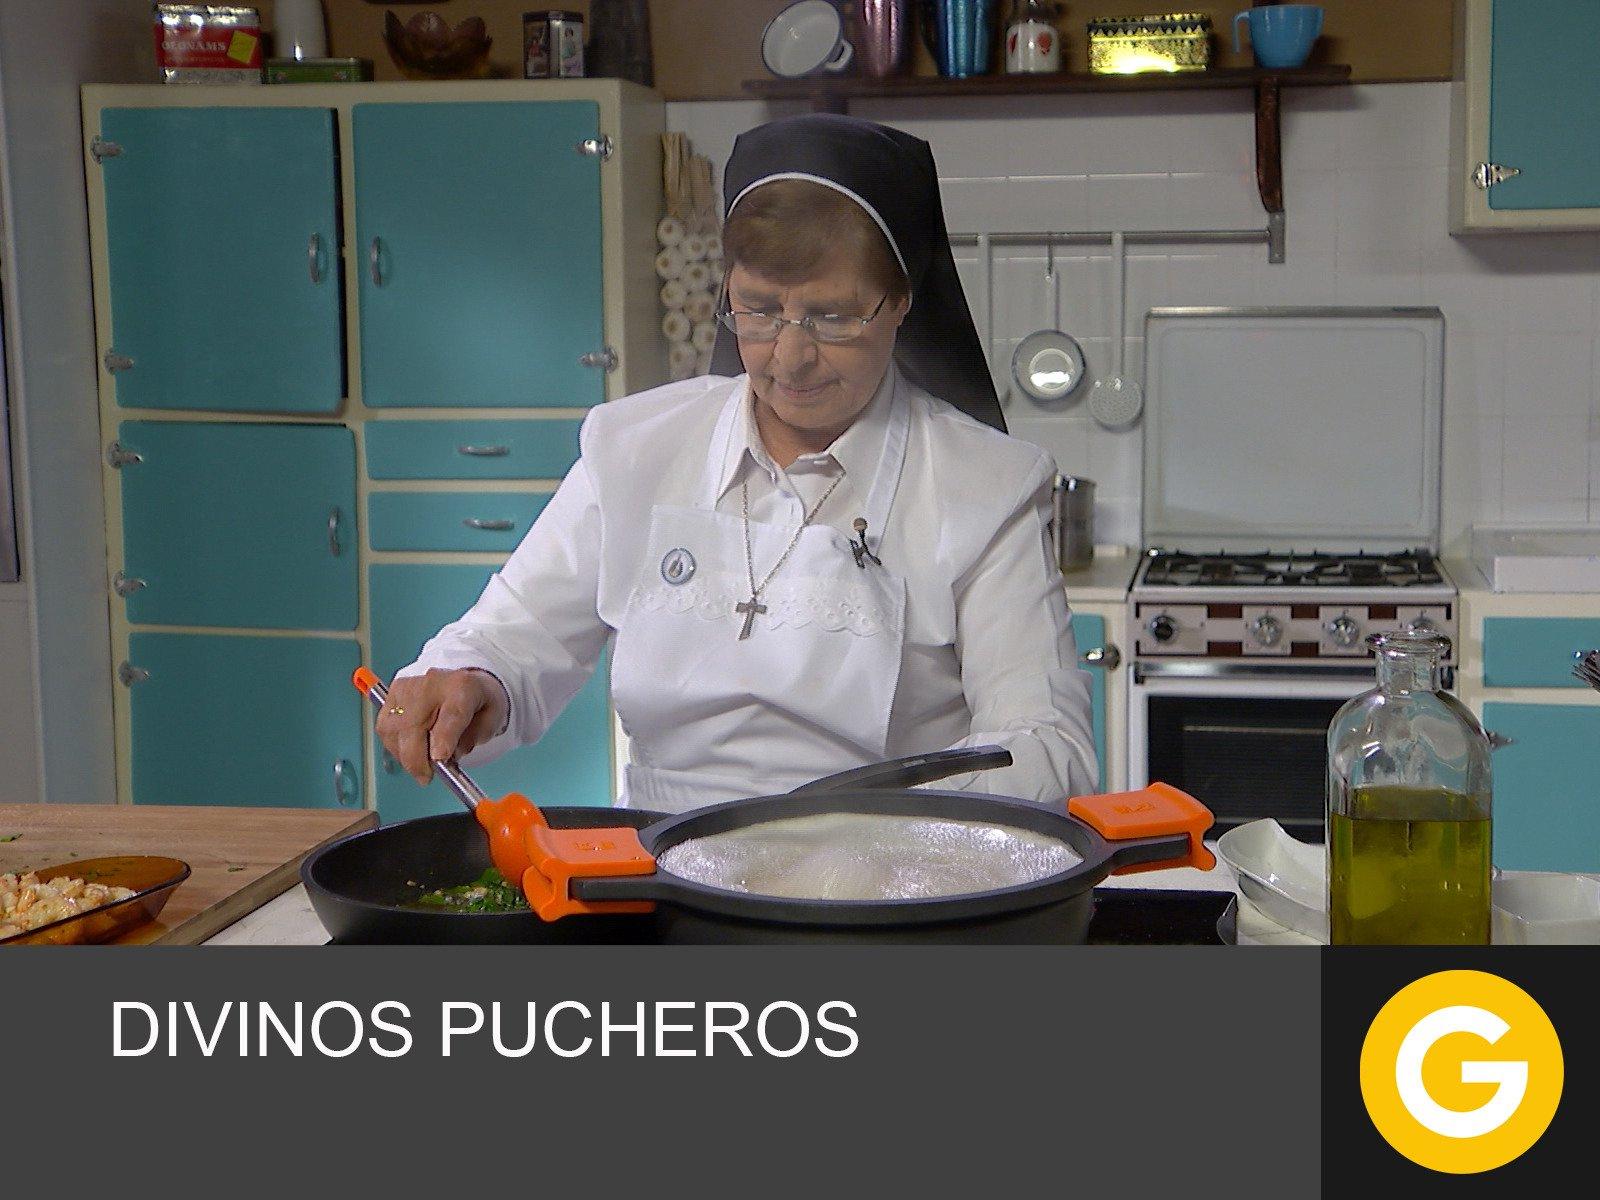 Watch Divinos Pucheros Prime Video